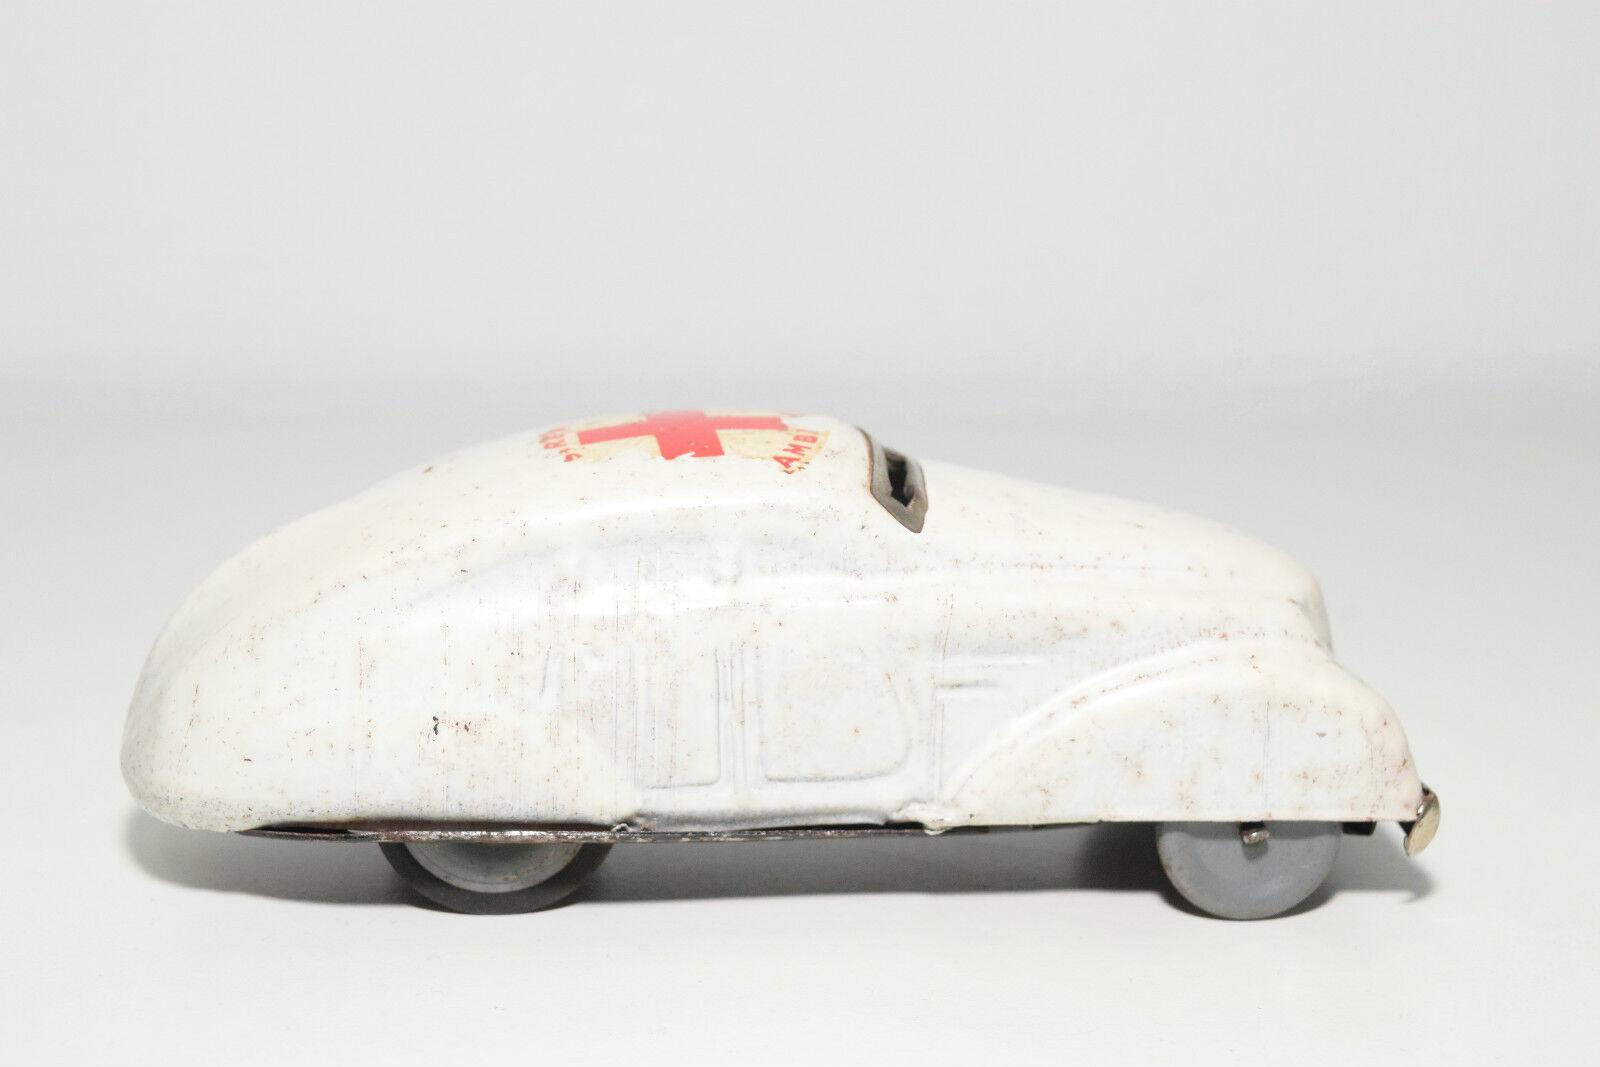 TINPLATE BLECH ENGLAND BRITISH SIREN AMBULANCE CAR WHITE WHITE WHITE EXCELLENT CONDITION c65e5e